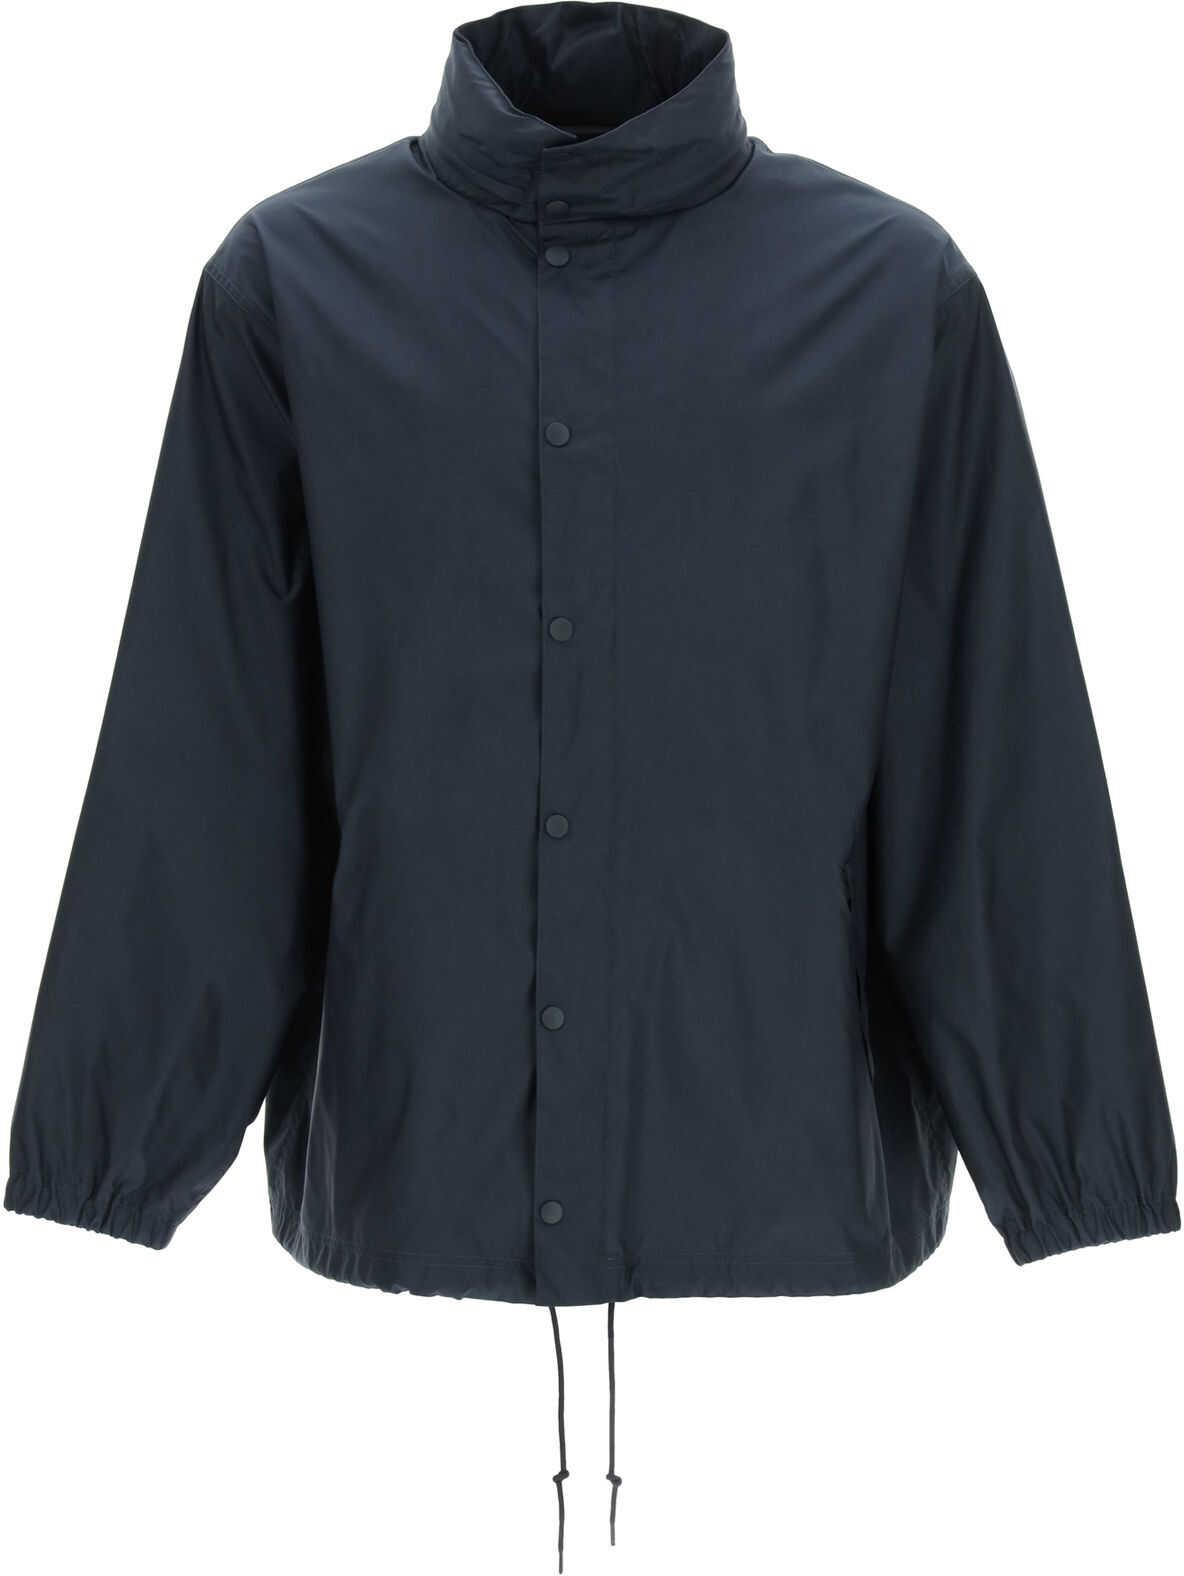 Balenciaga Nylon Rain Jacket Languages DARK NAVY imagine